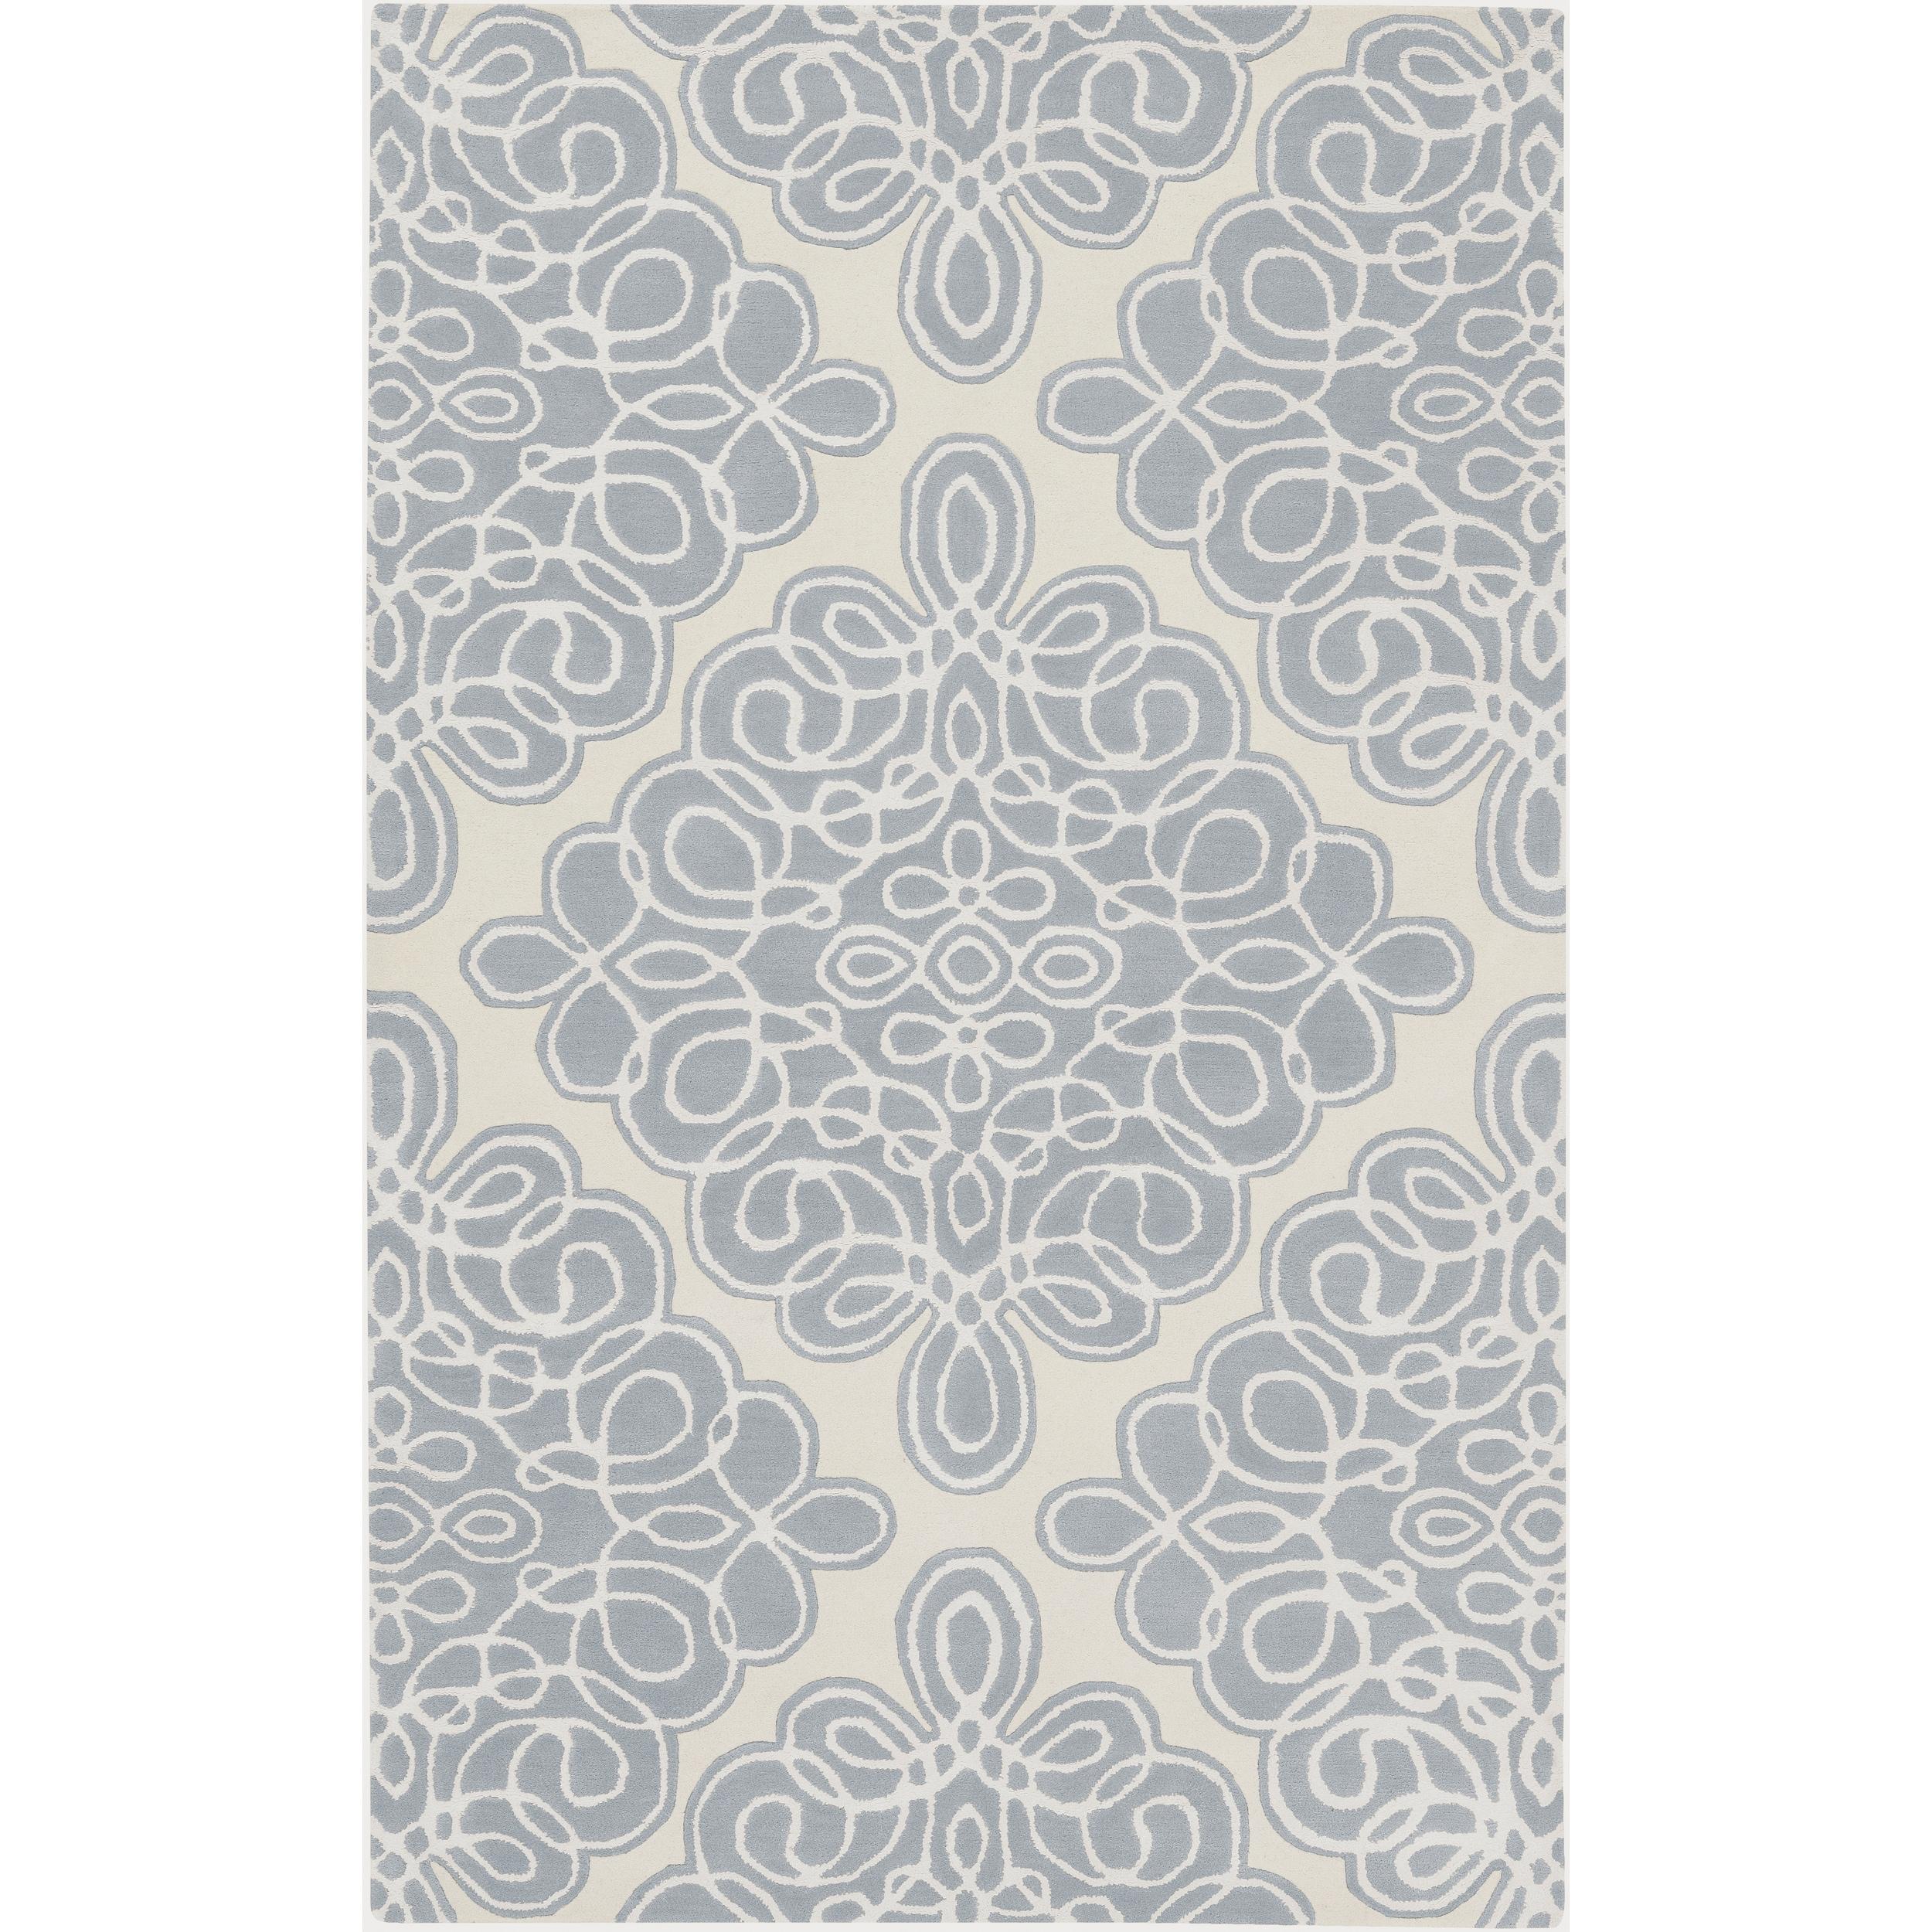 Hand-tufted White Cane Geometric Pattern Wool Area Rug (9' x 13') - 9' x 13'